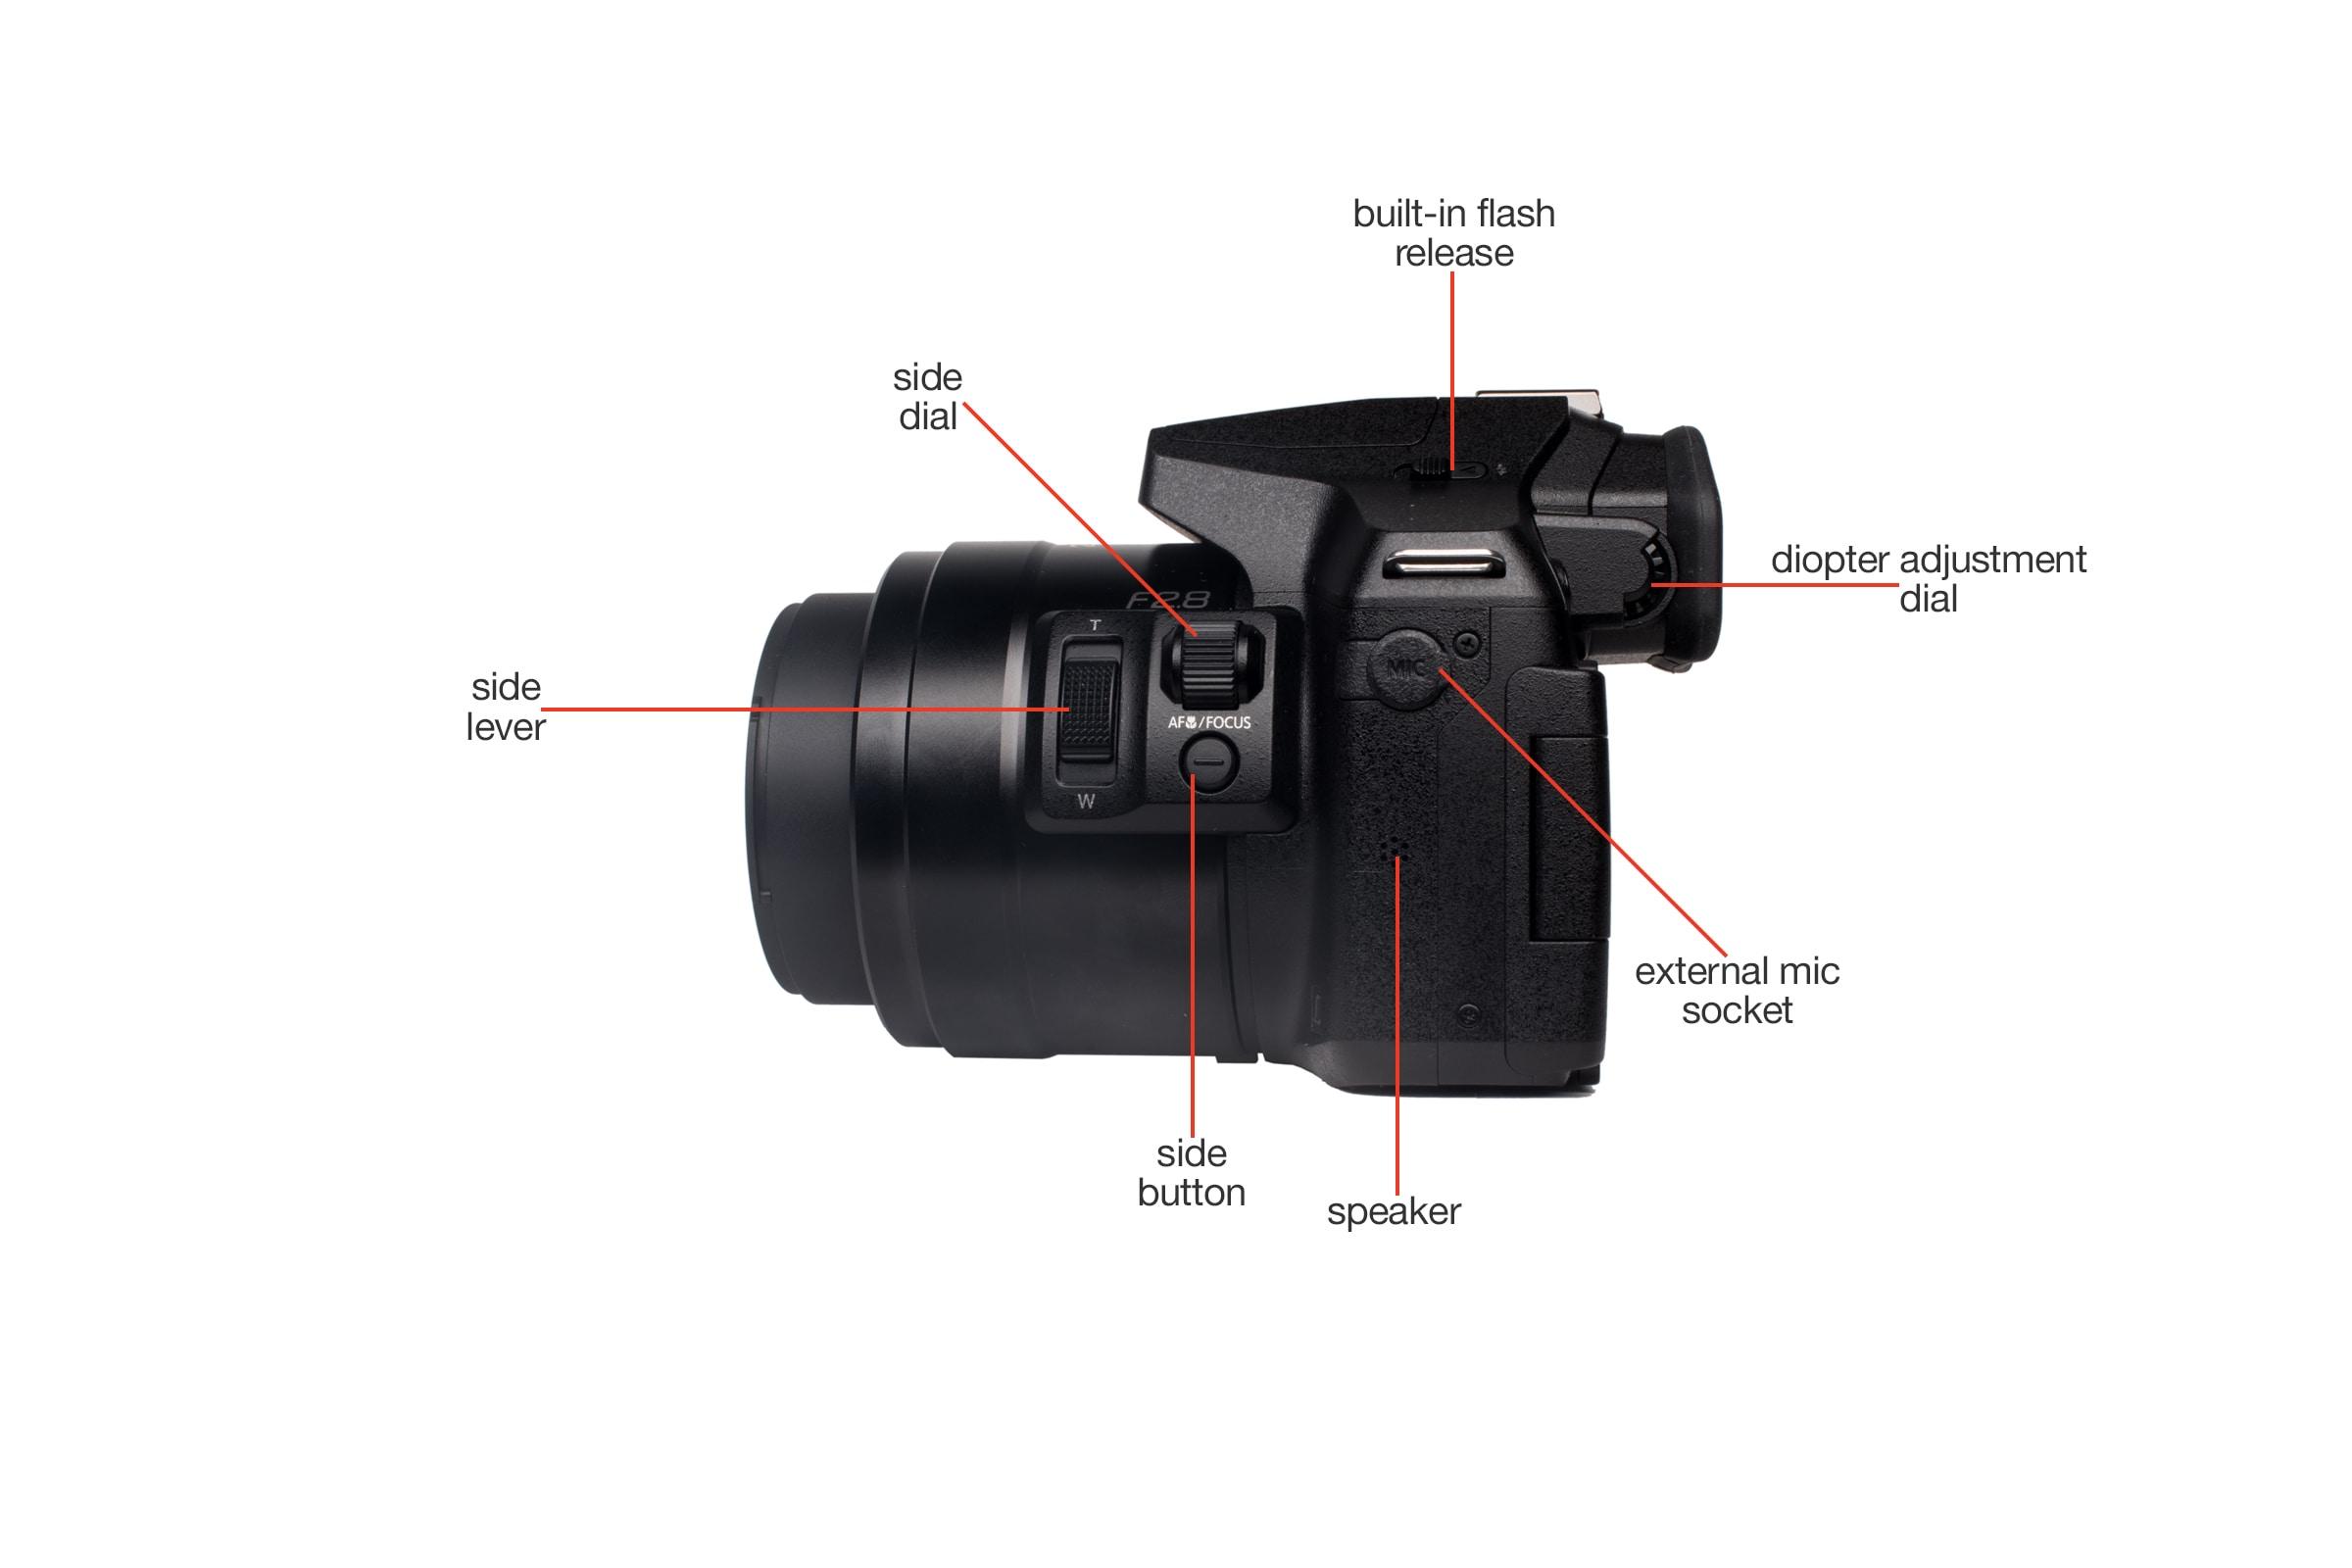 Left view of the Panasonic Lumix DMC-FZ300.